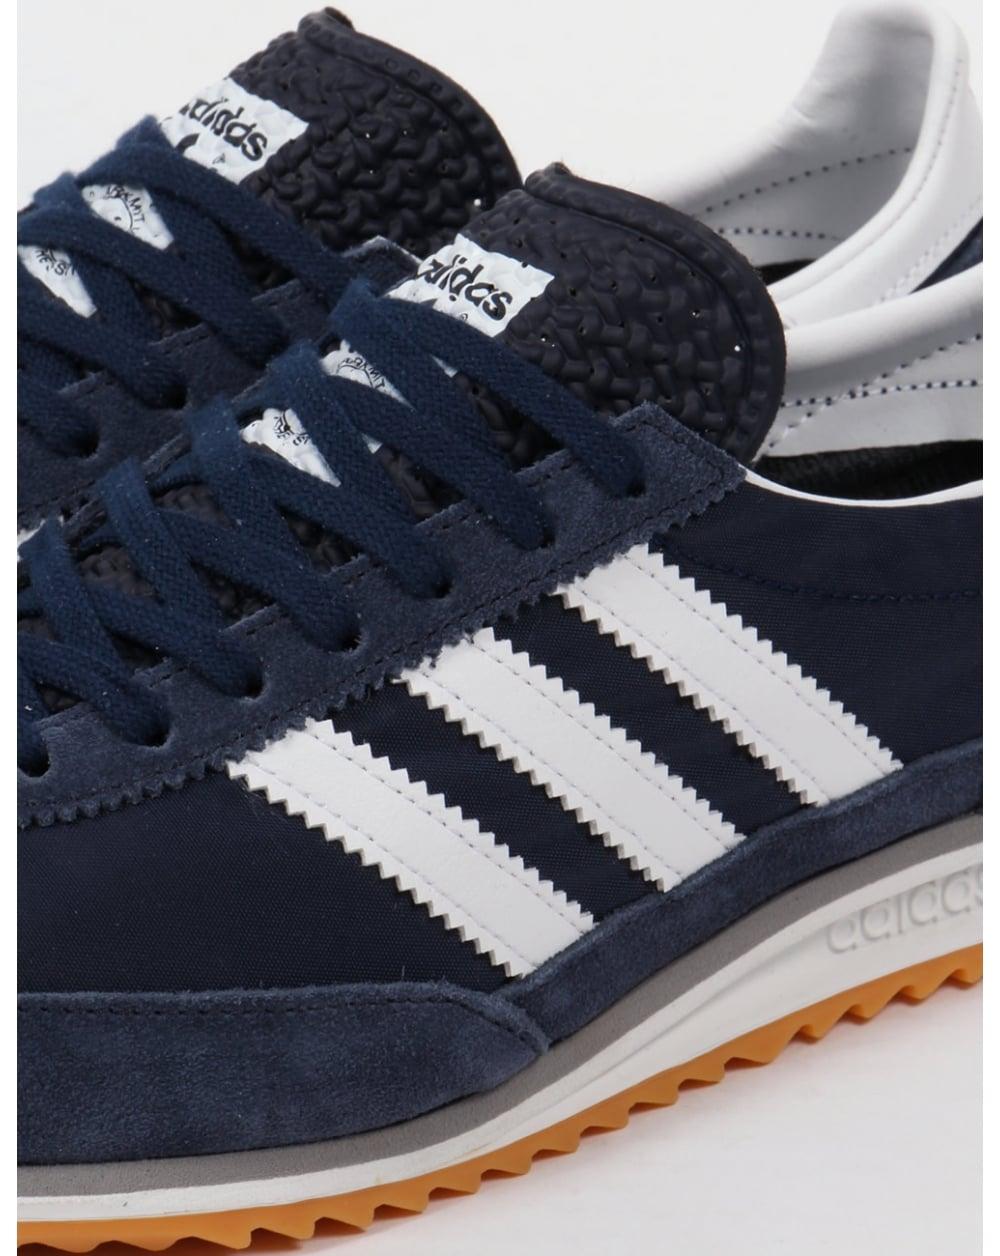 Adidas Sl 72 Navy